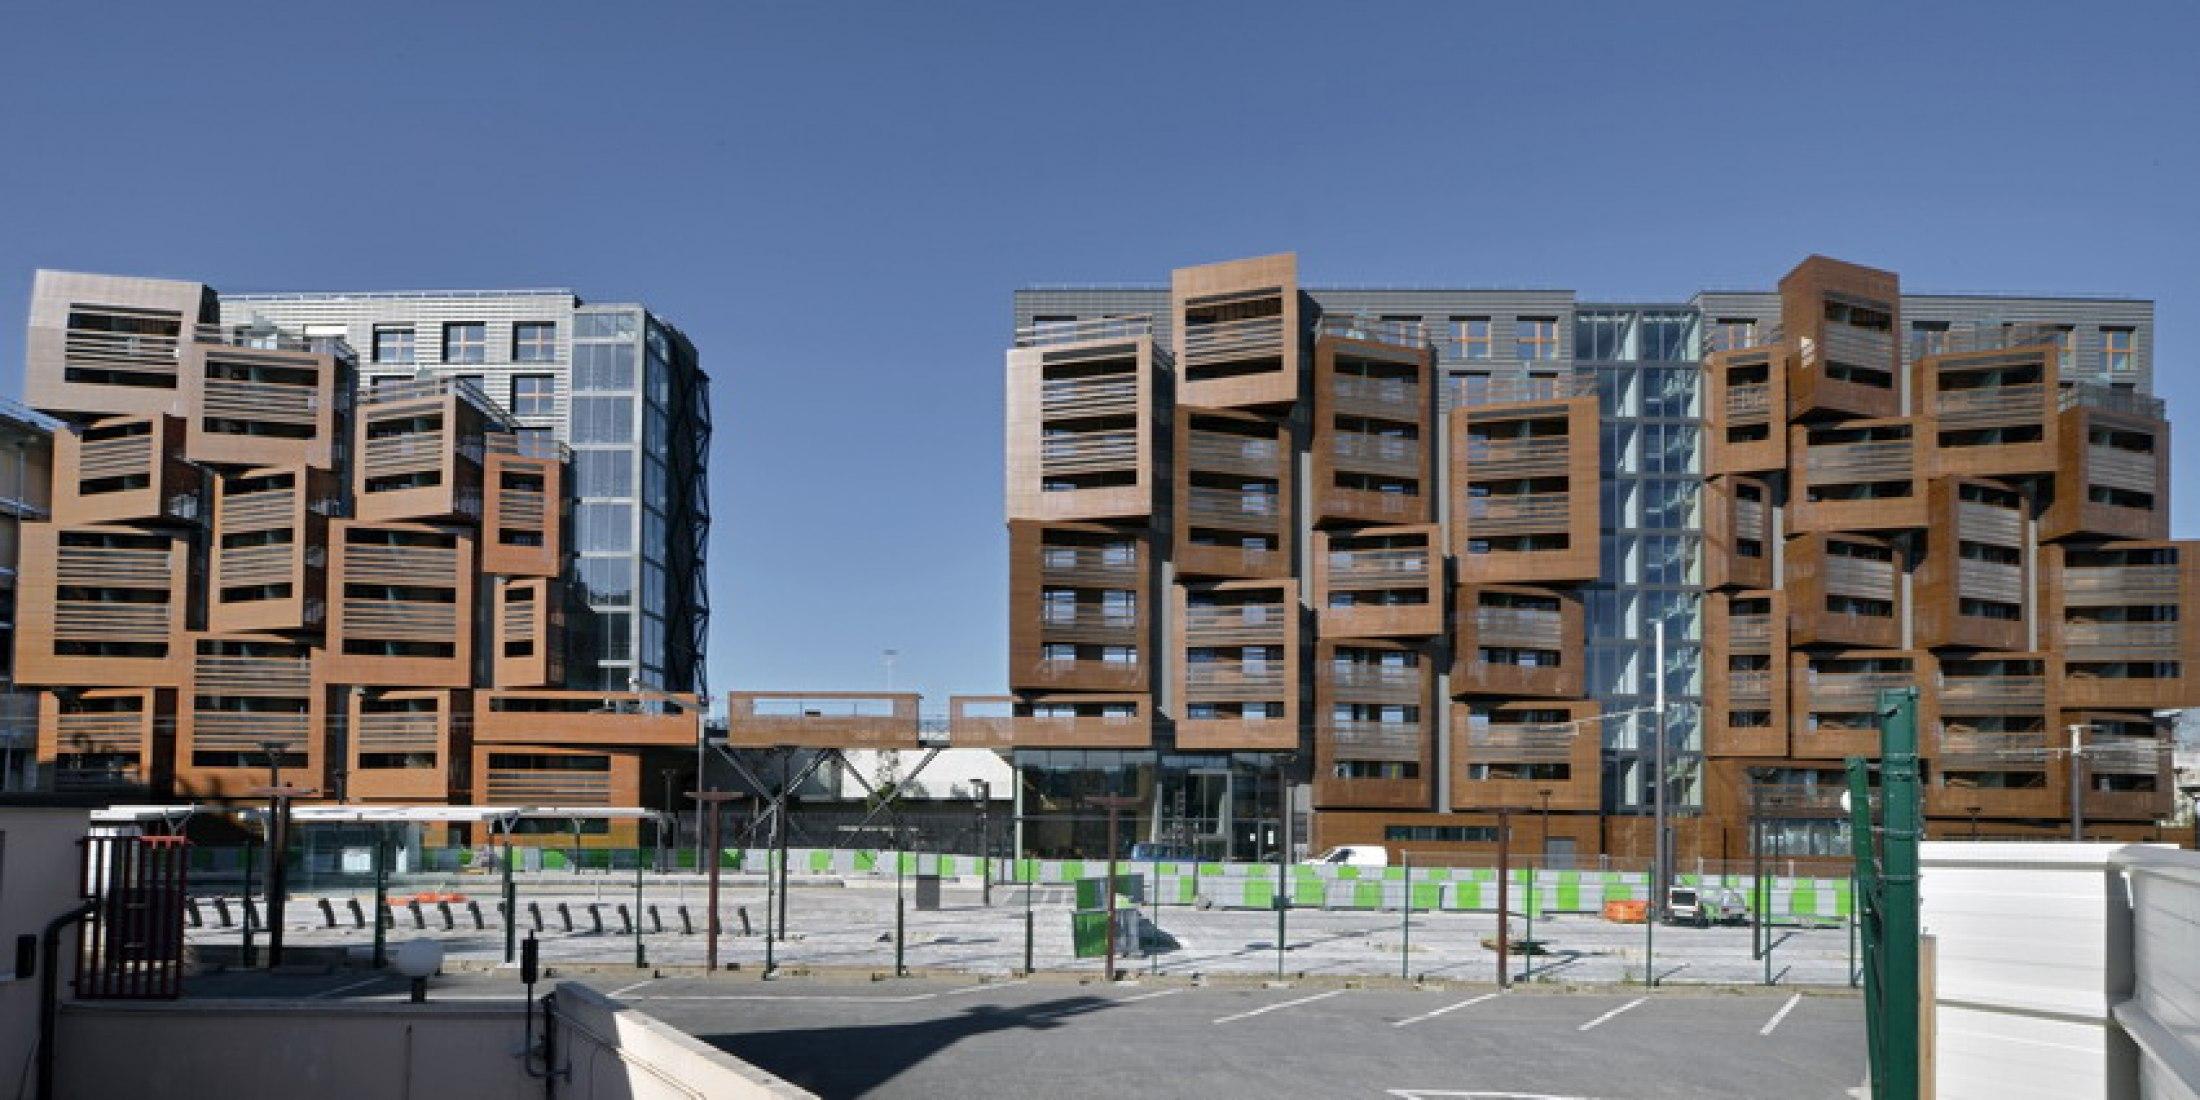 Apartamentos Basket por OFIS arhitekti. Fotografía @ Tomaz Gregoric.